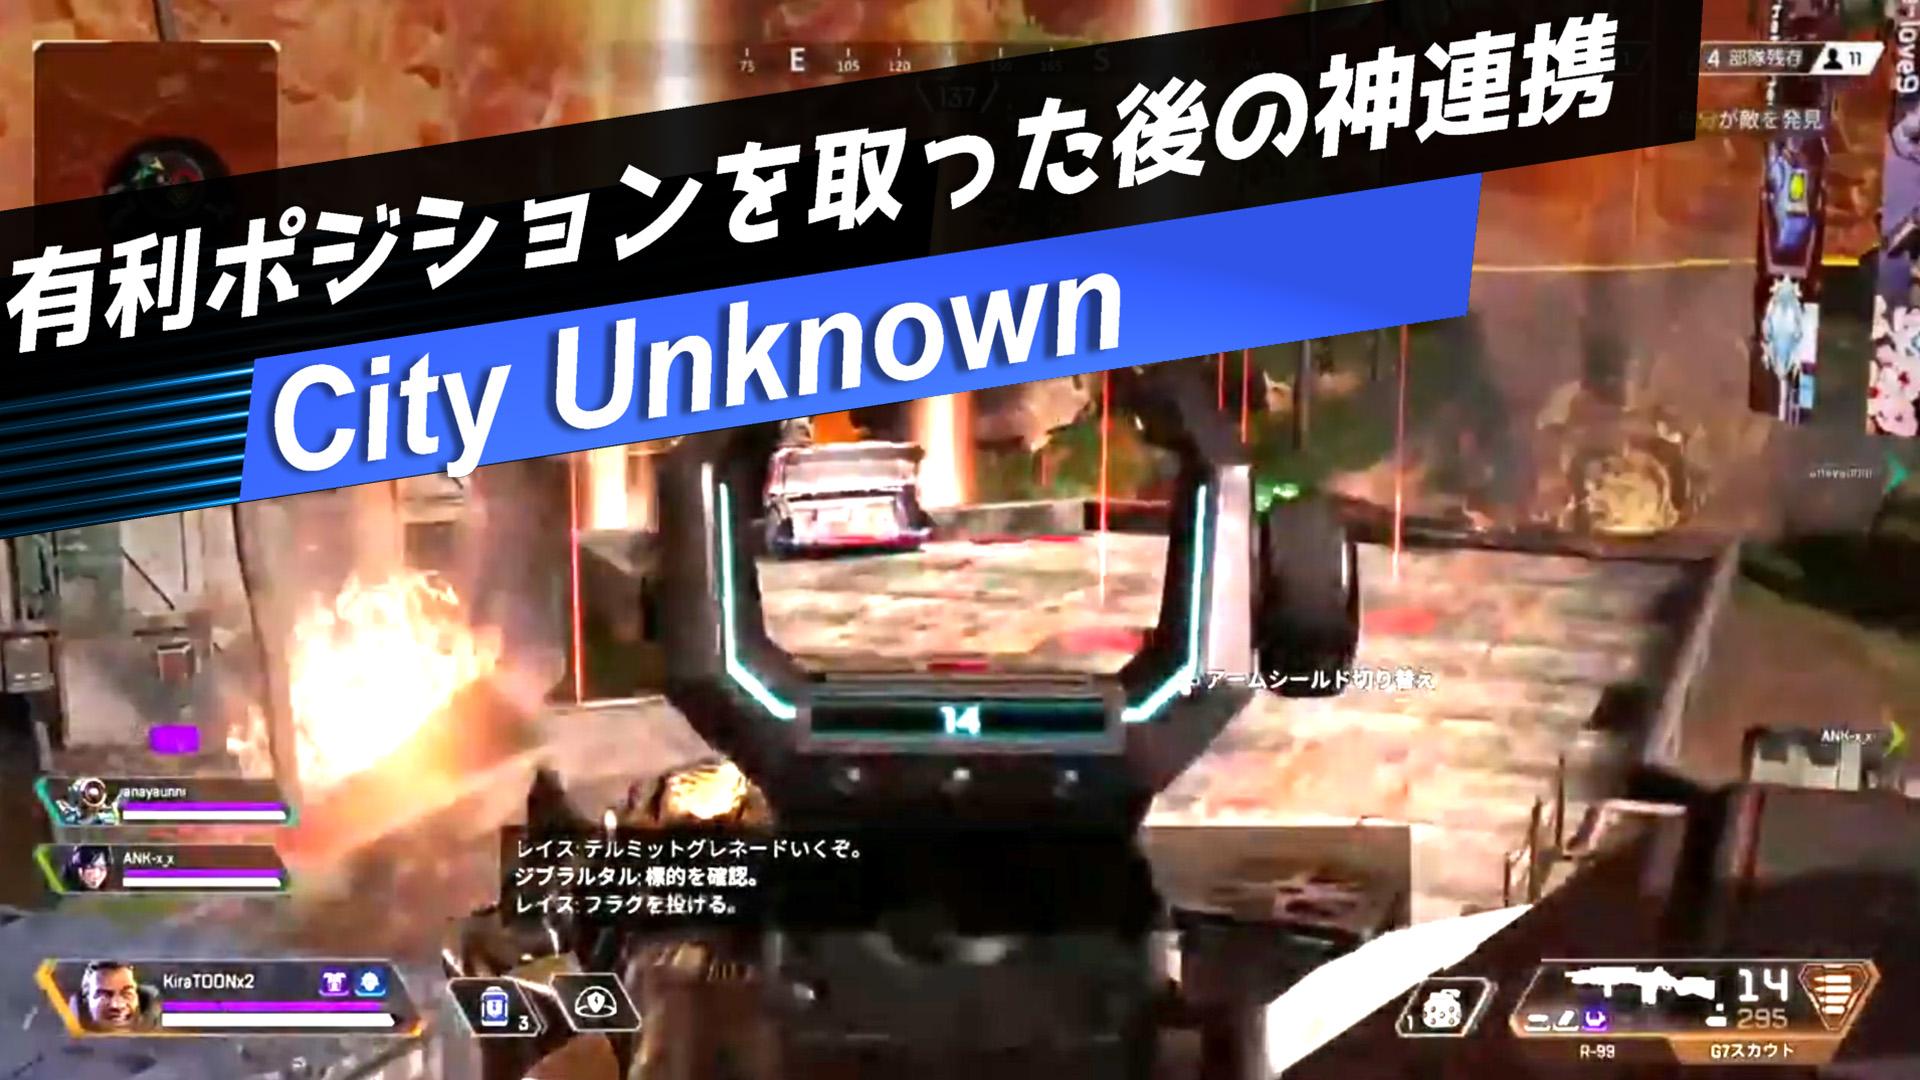 【APEX大会ハイライト】有利ポジションを取った後の神連携 | チーム「City Unknown」